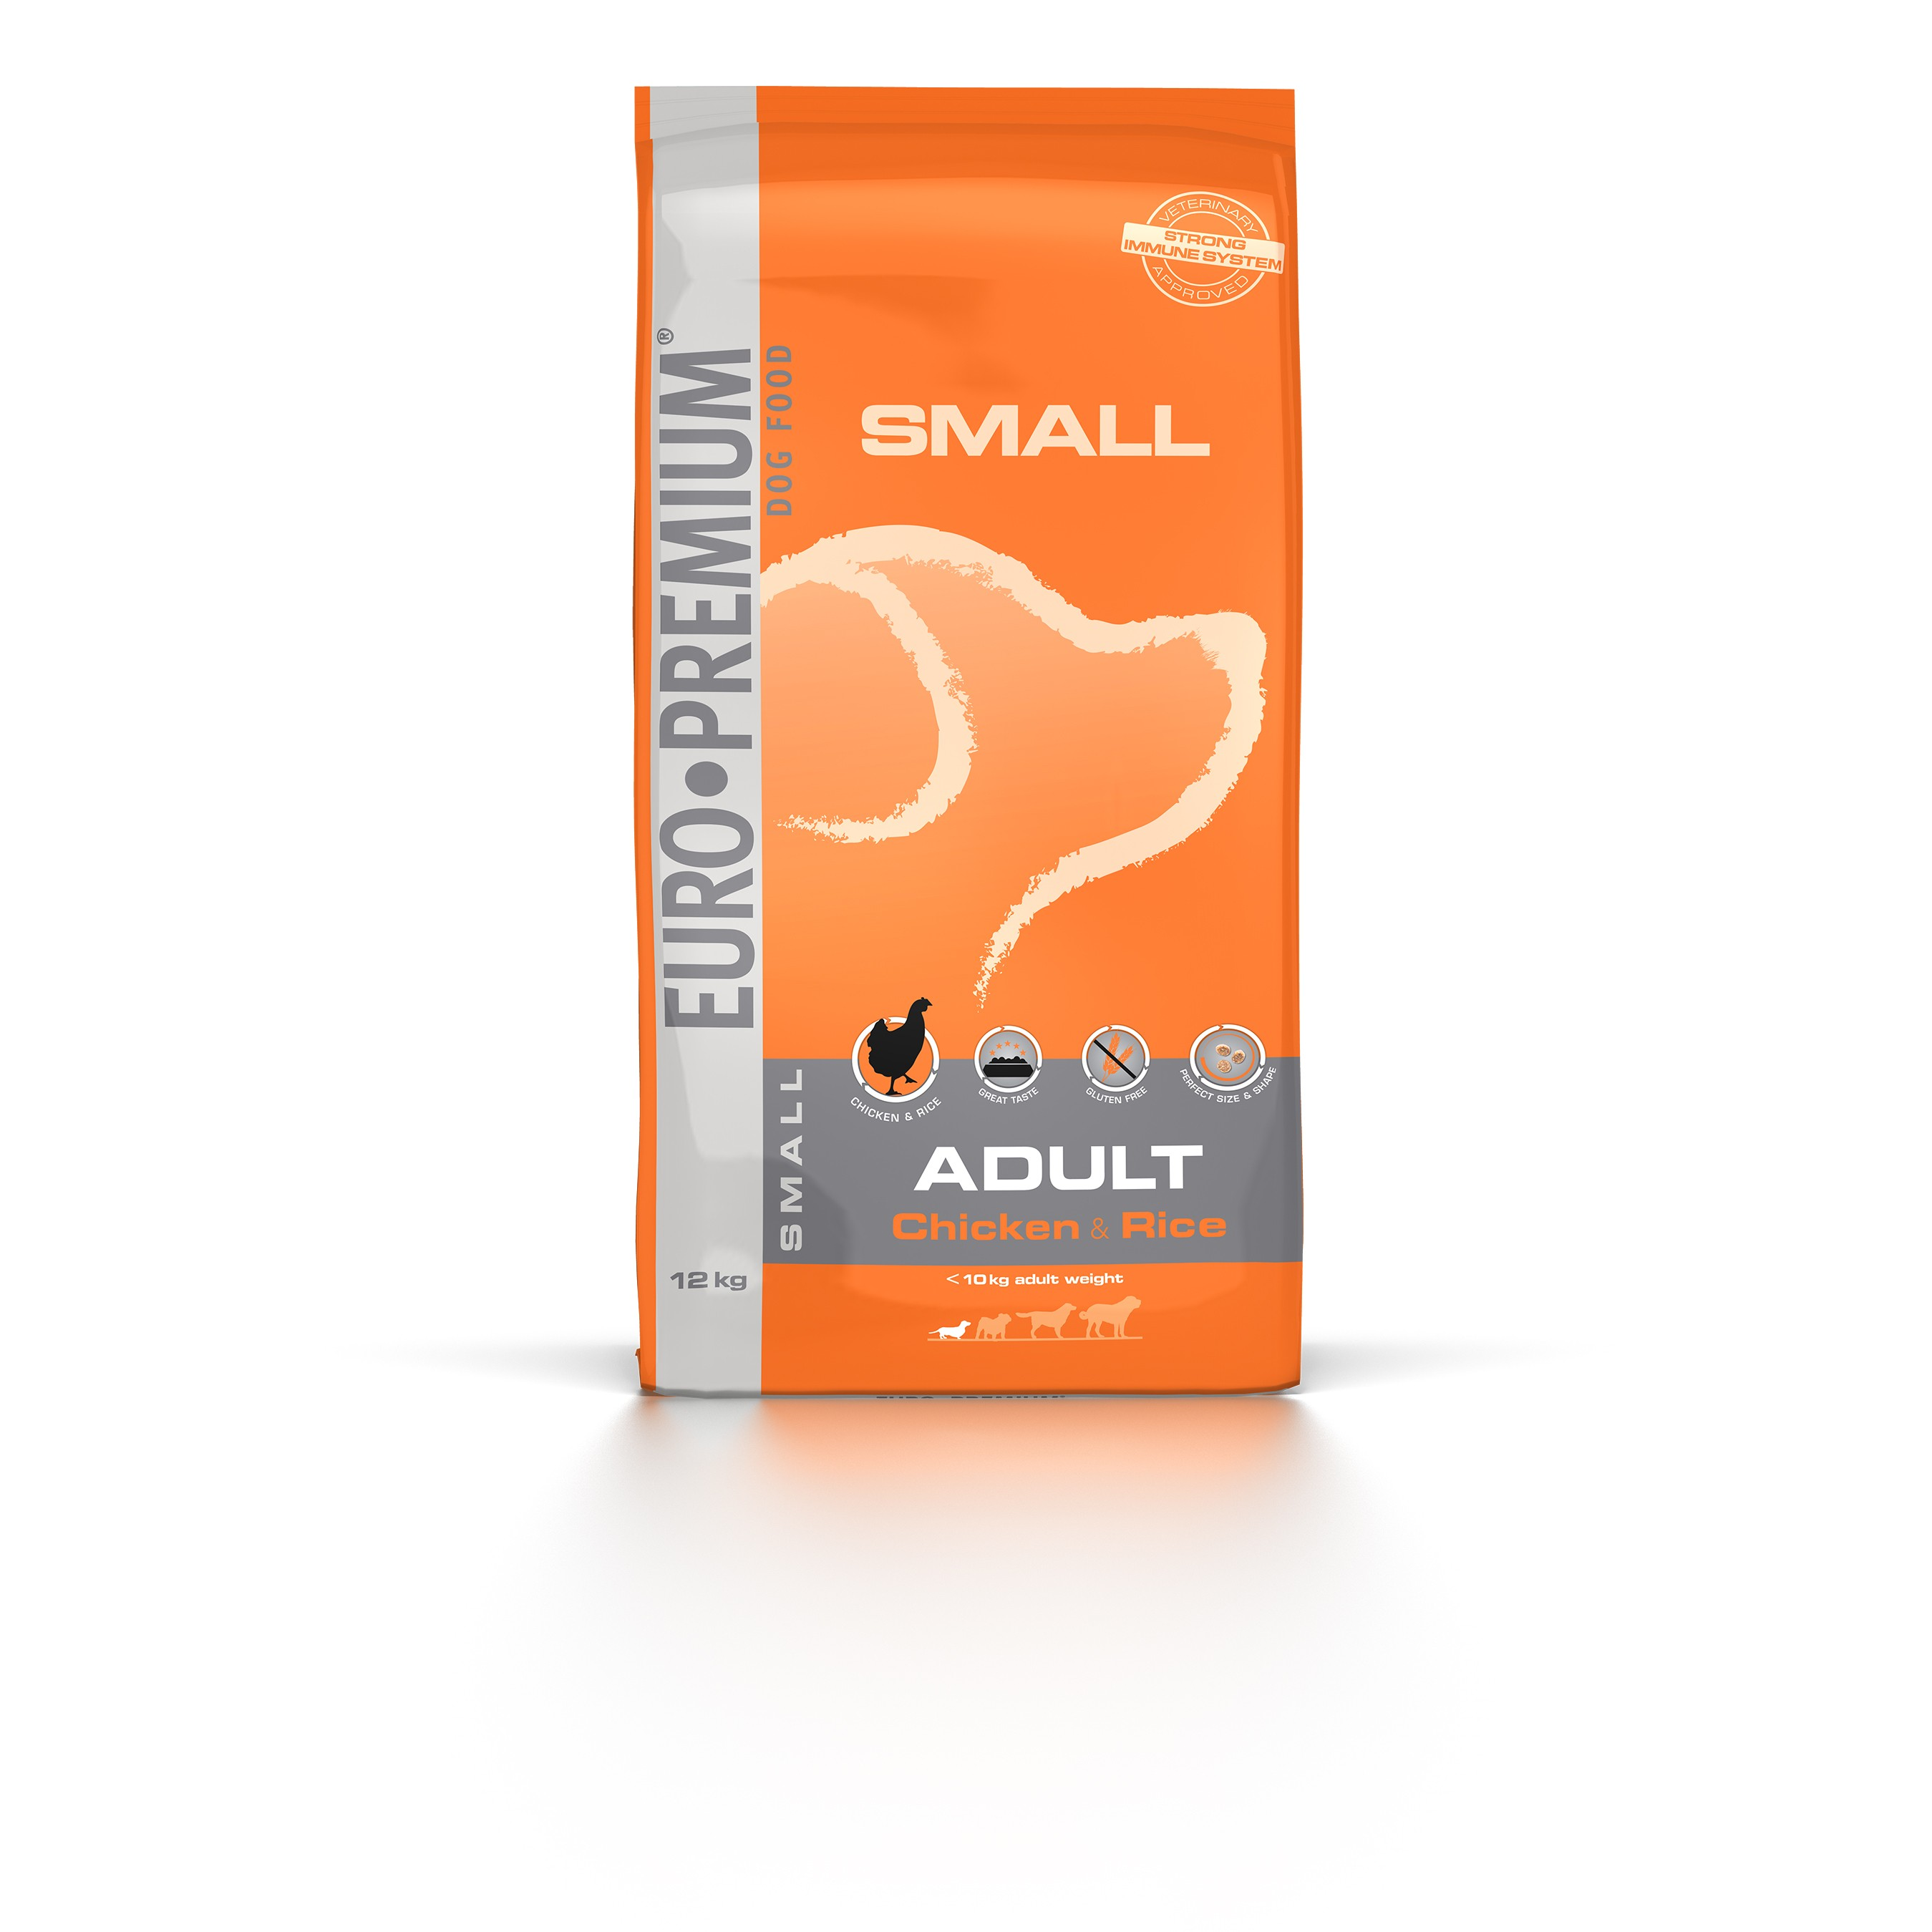 Euro Premium Small Adult Chicken & Rice hondenvoer